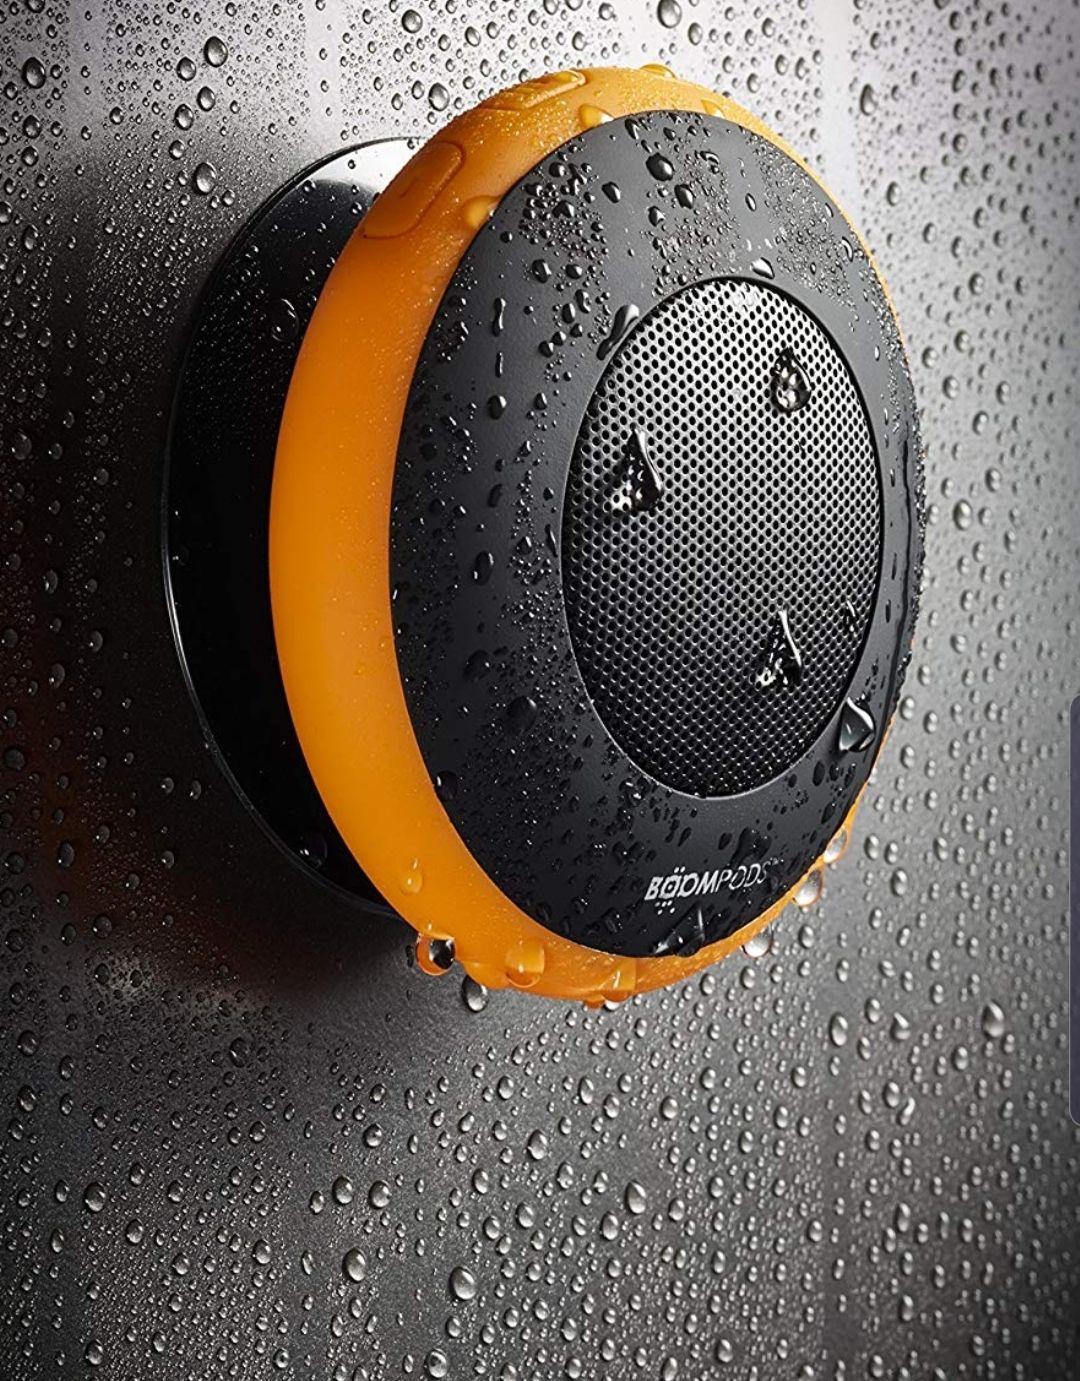 BOOMPODS Aquapod Waterproof Bluetooth Speaker (Orange) - Big Bass - 4 Other Items Bundled £17.99 prime / £22.48 non prime @ Amazon